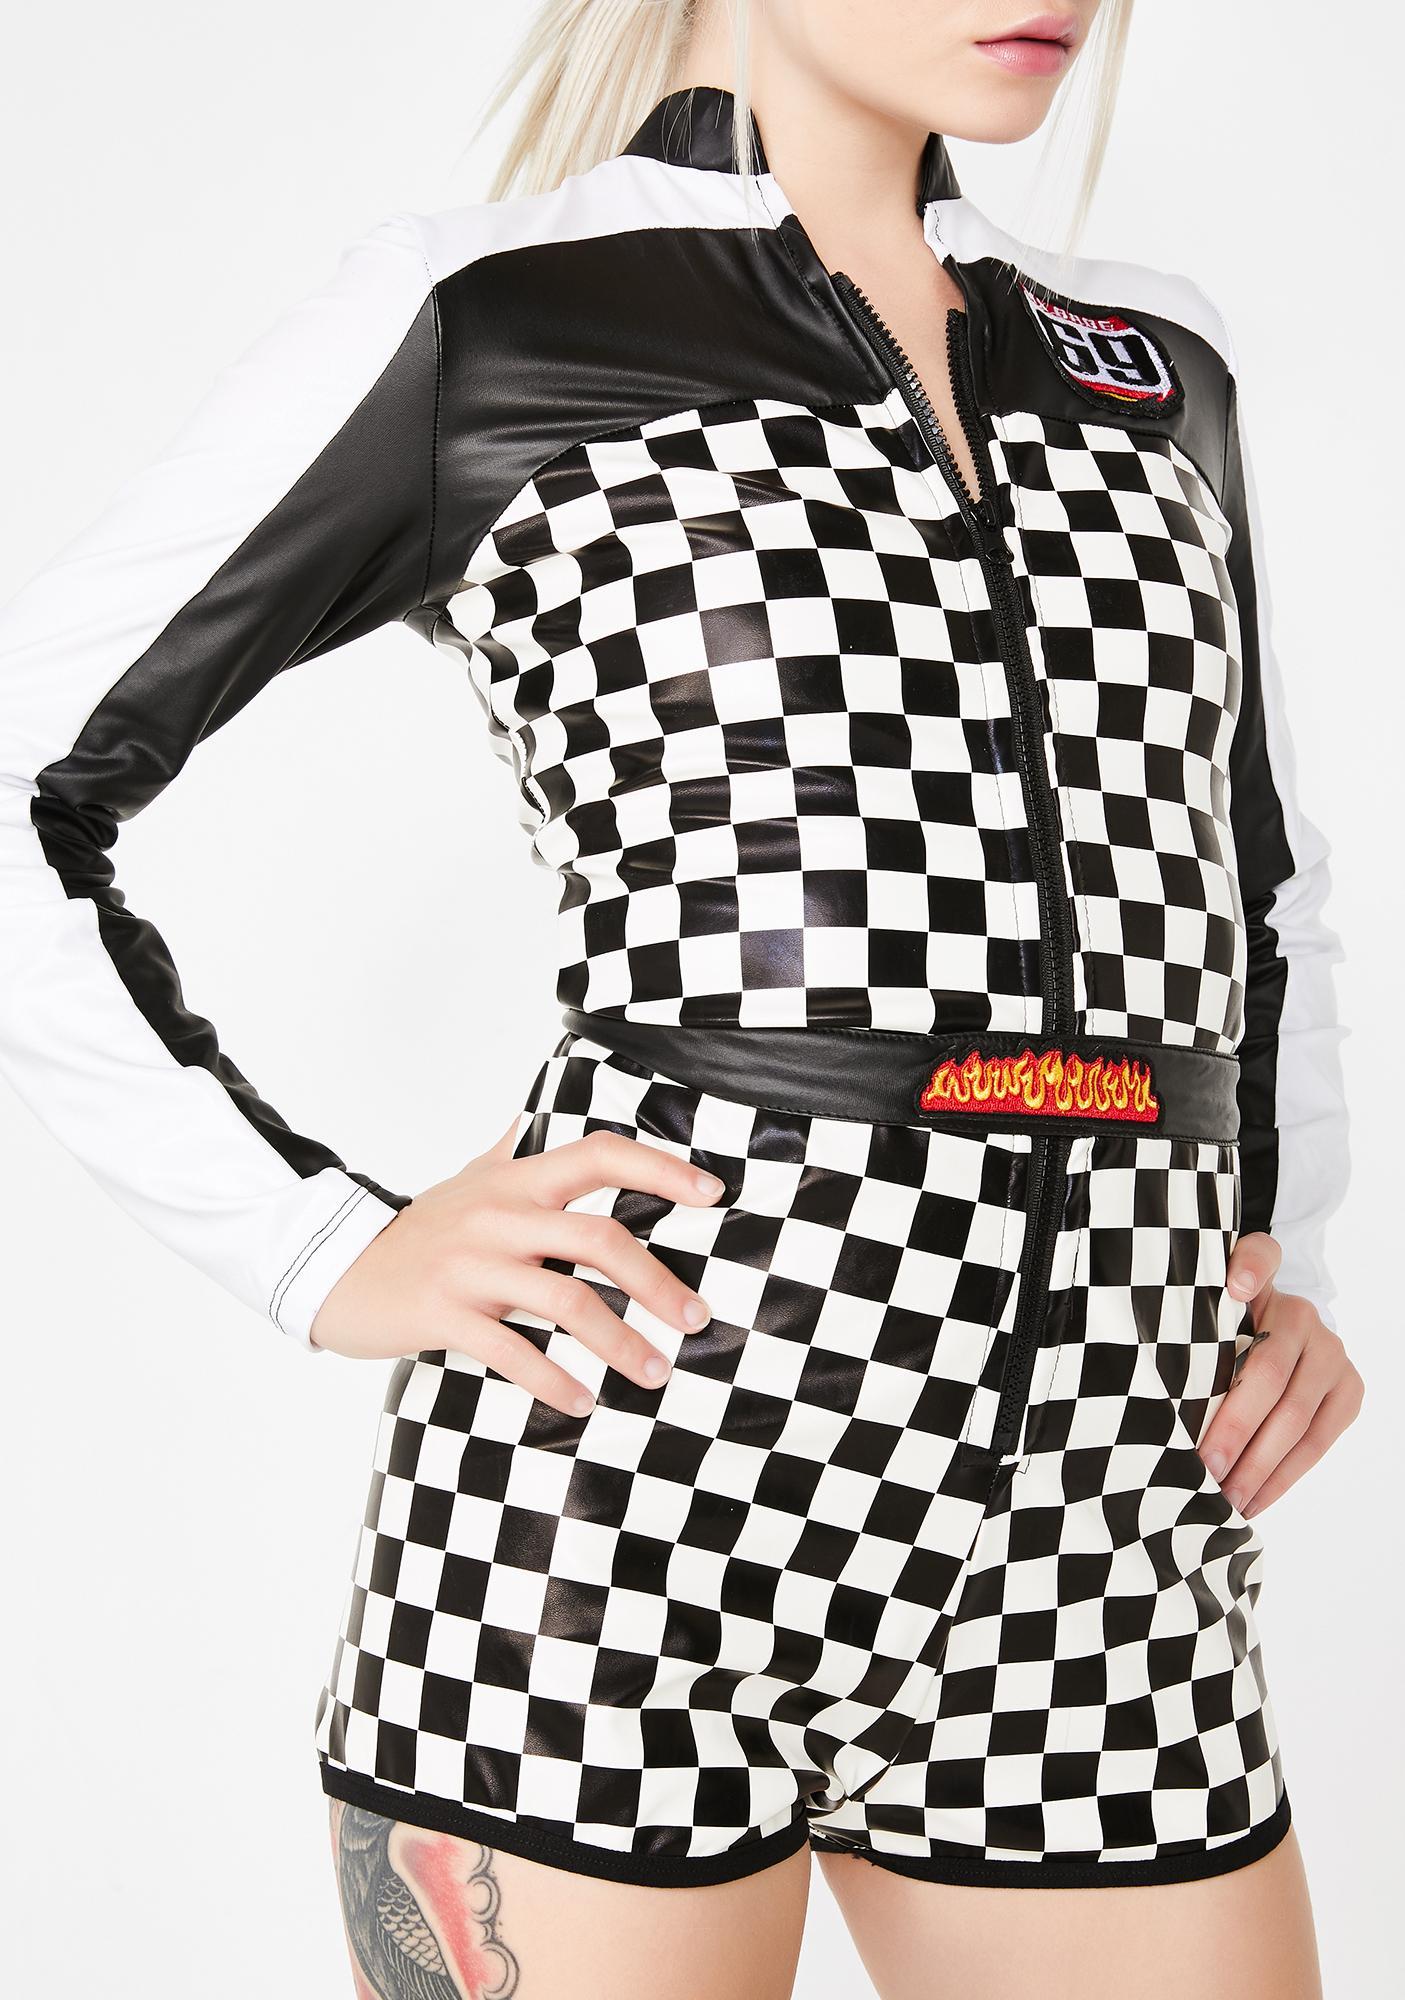 Dolls Kill First To Finish Motocross Costume